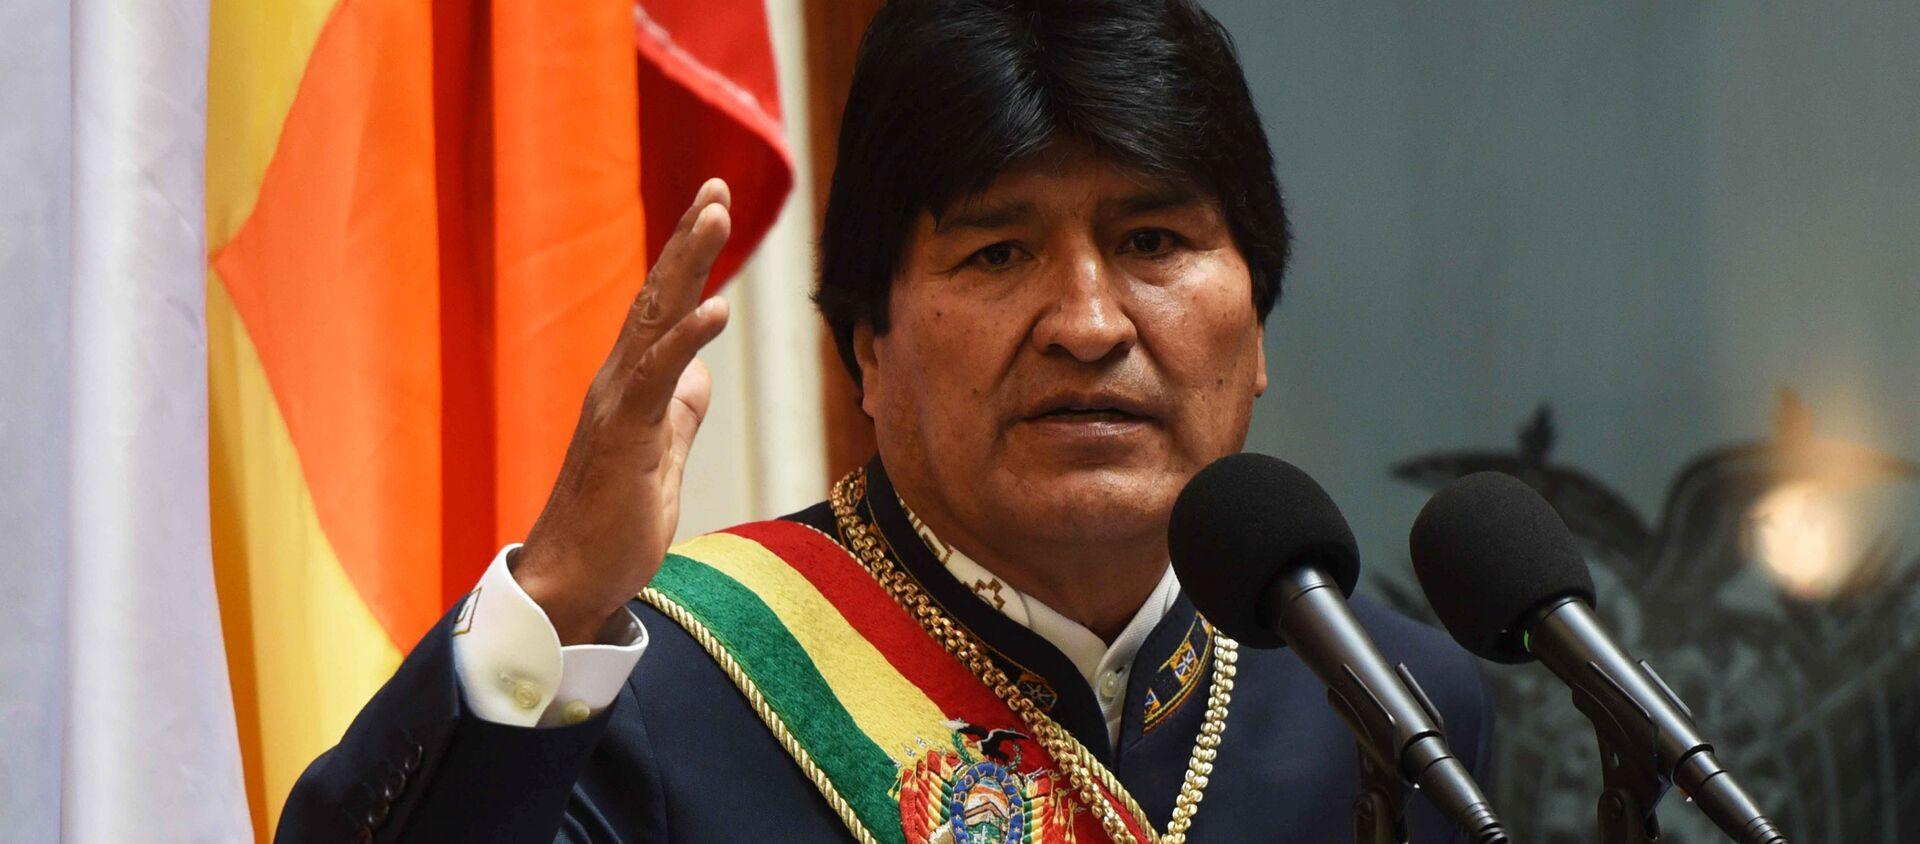 Evo Morales, presidente de Bolivia - Sputnik Mundo, 1920, 02.04.2018